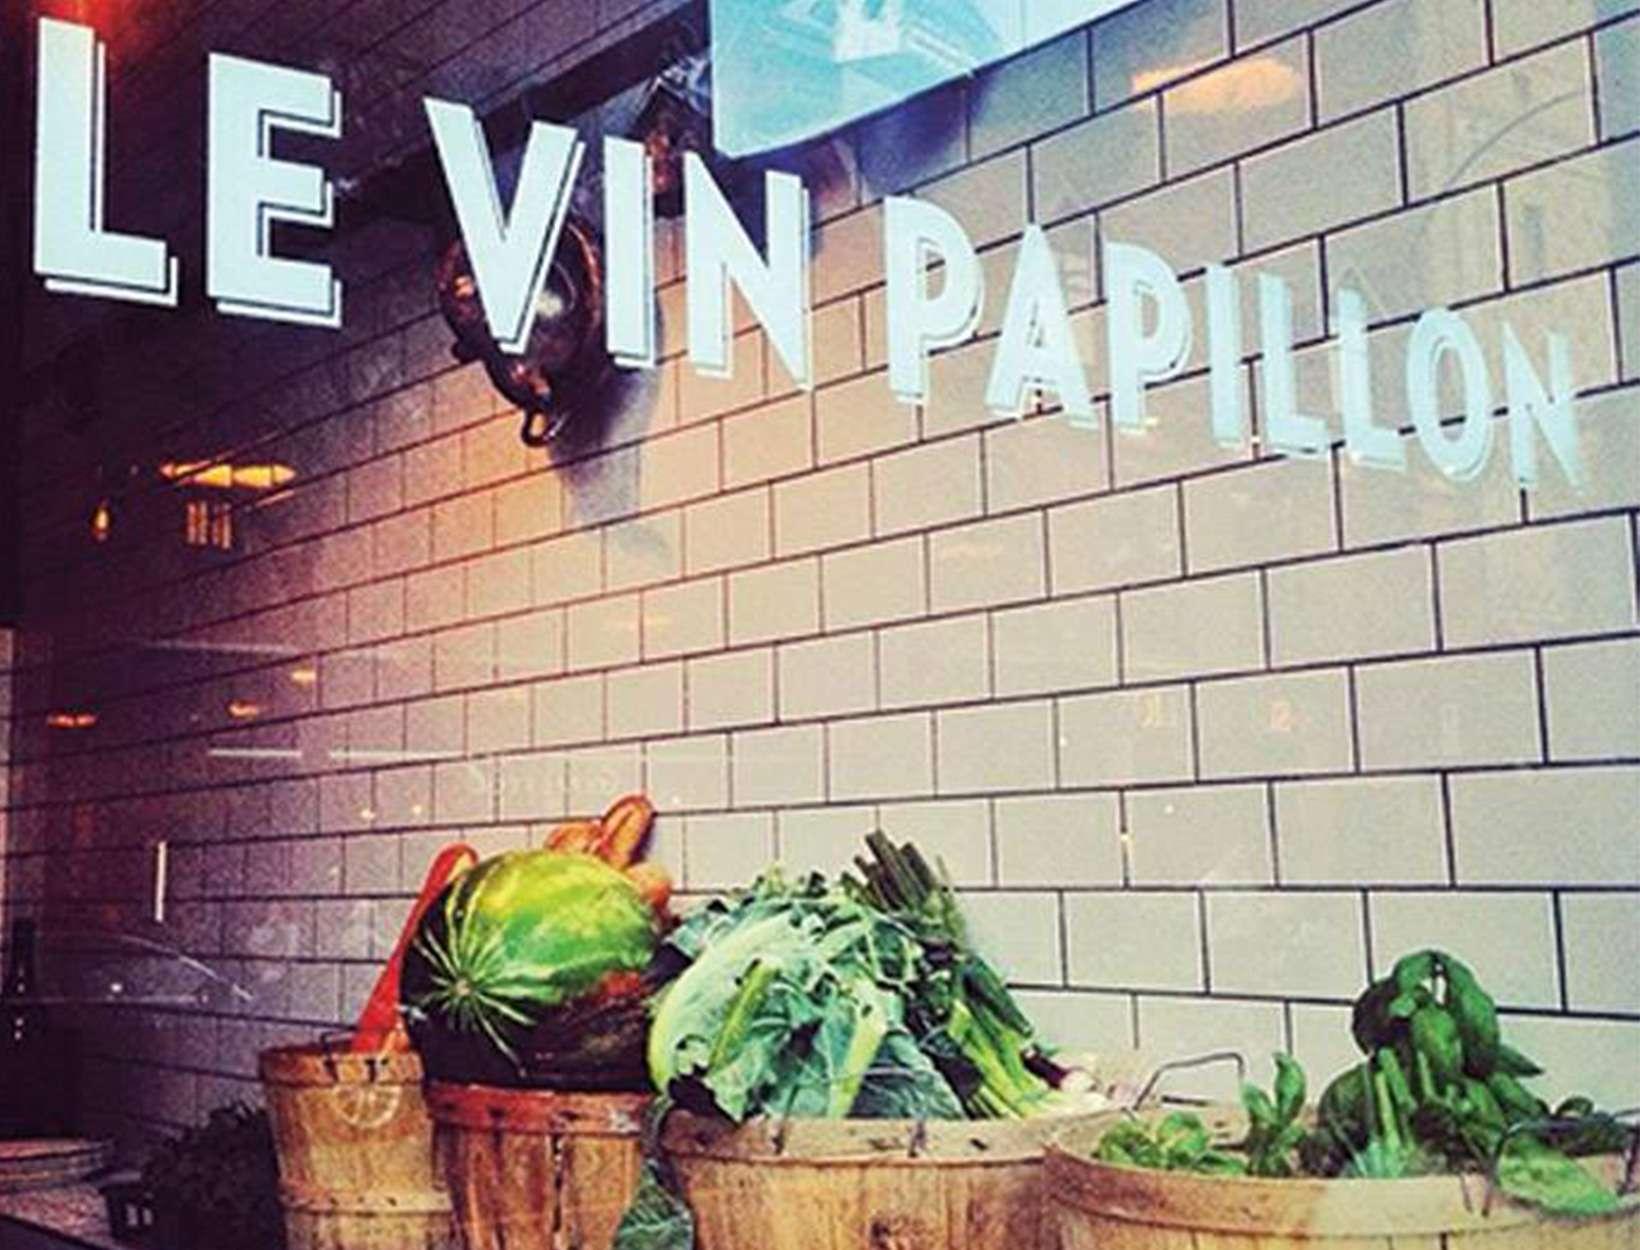 Le Vin Papillon  <br><em> Little Burgundy </em>